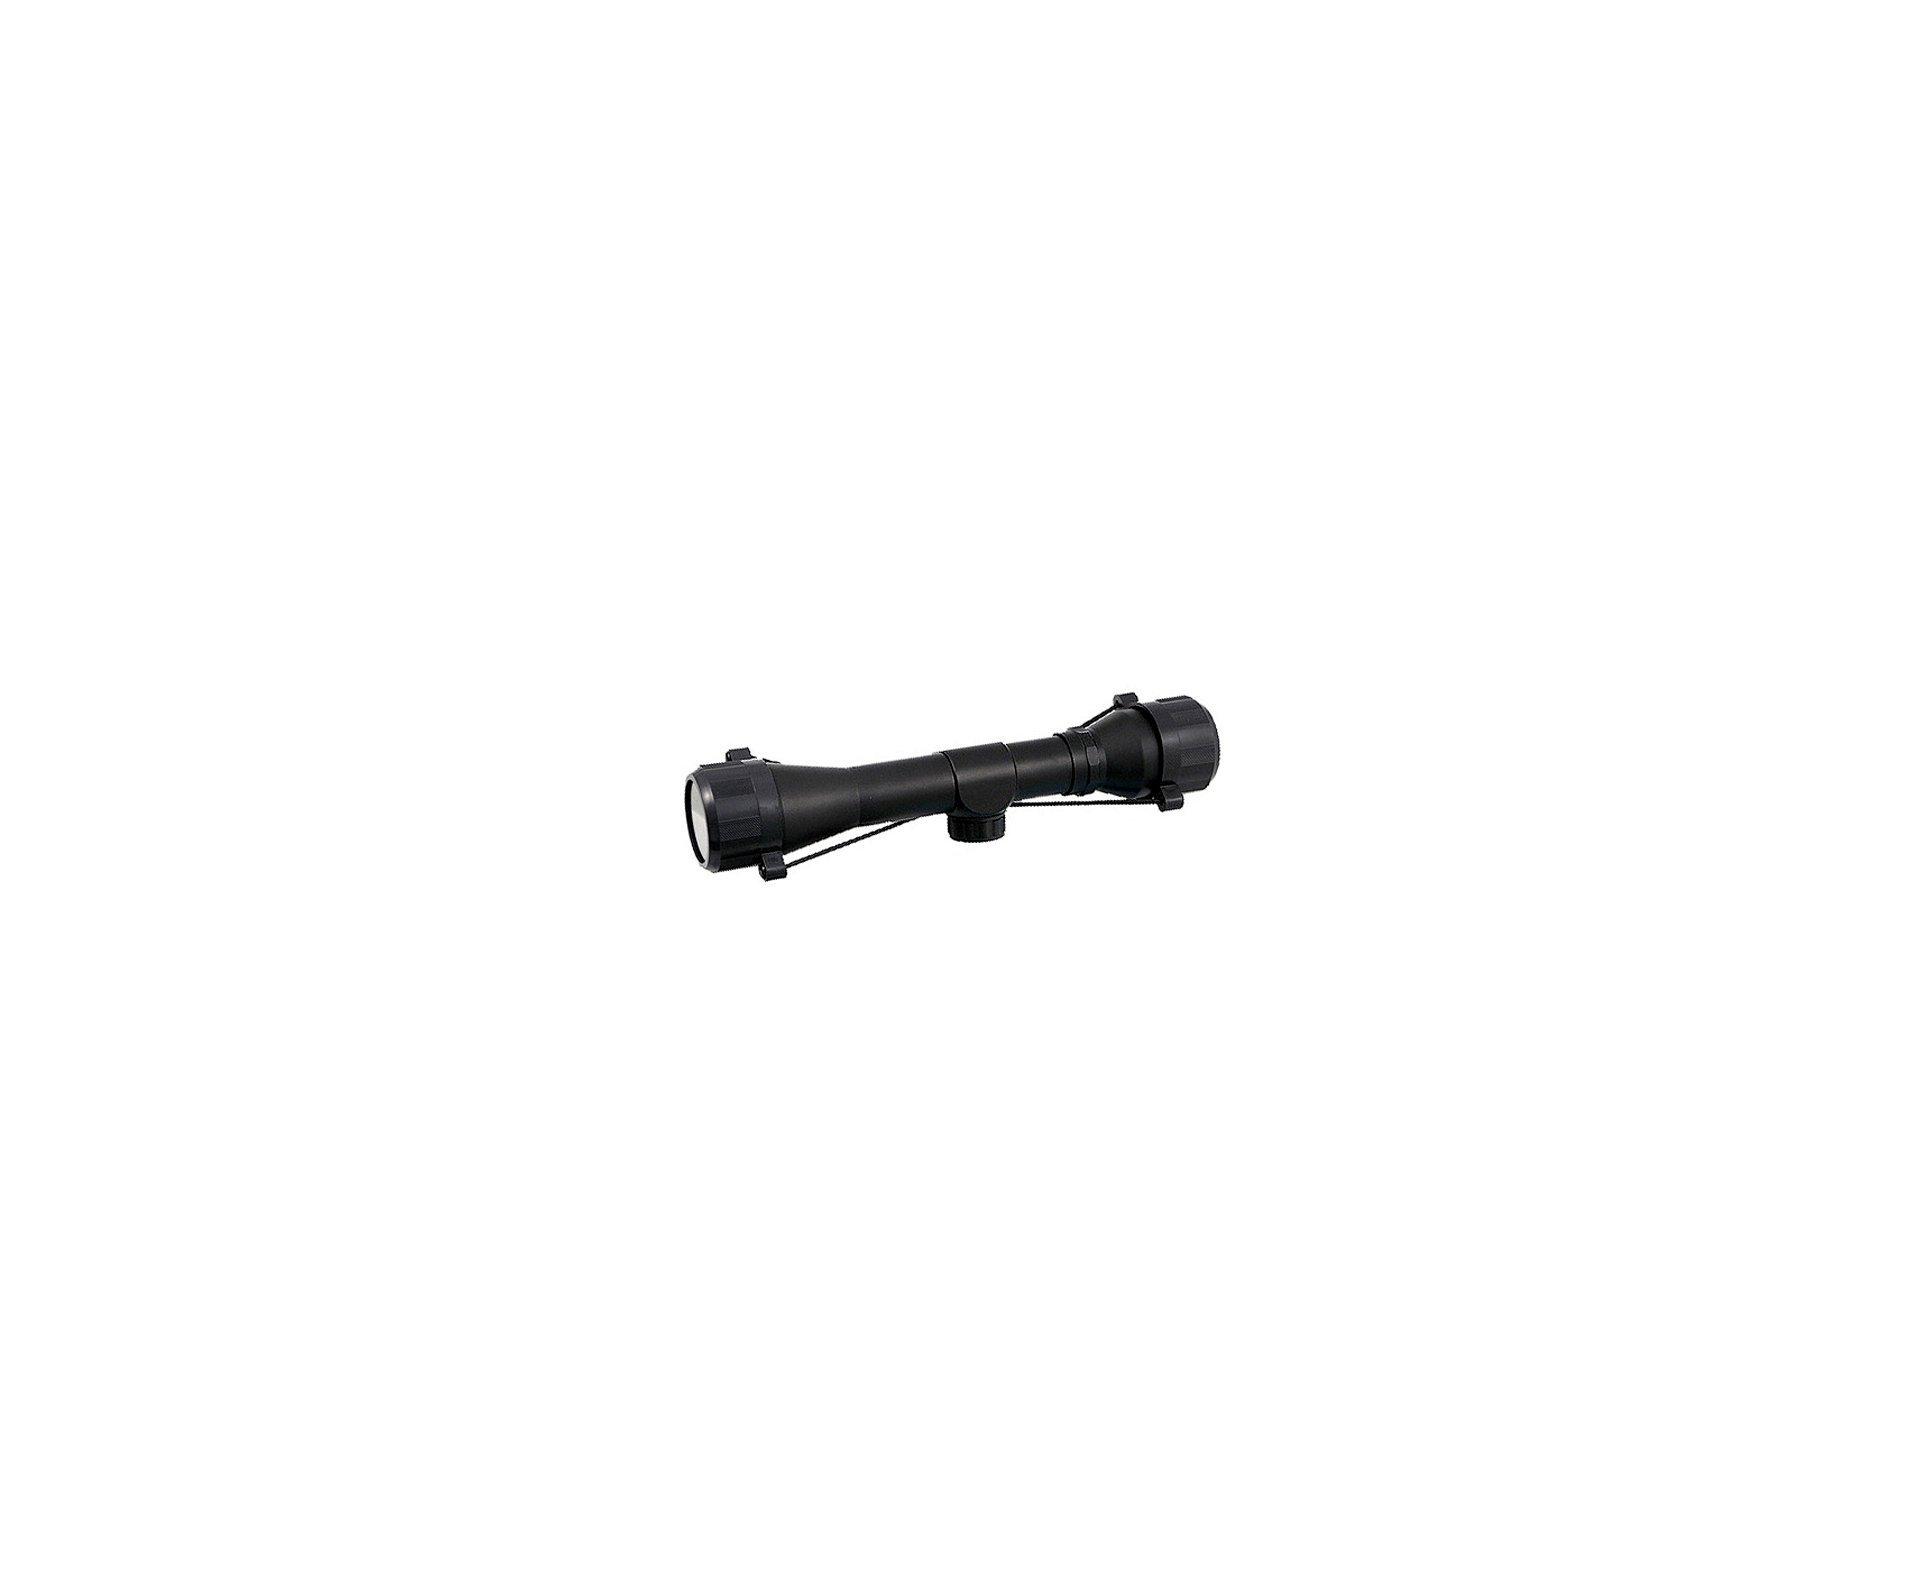 Carabina De Pressão Hatsan Ht 80 - Calibre 5,5 Mm + Luneta 4x32 + Capa